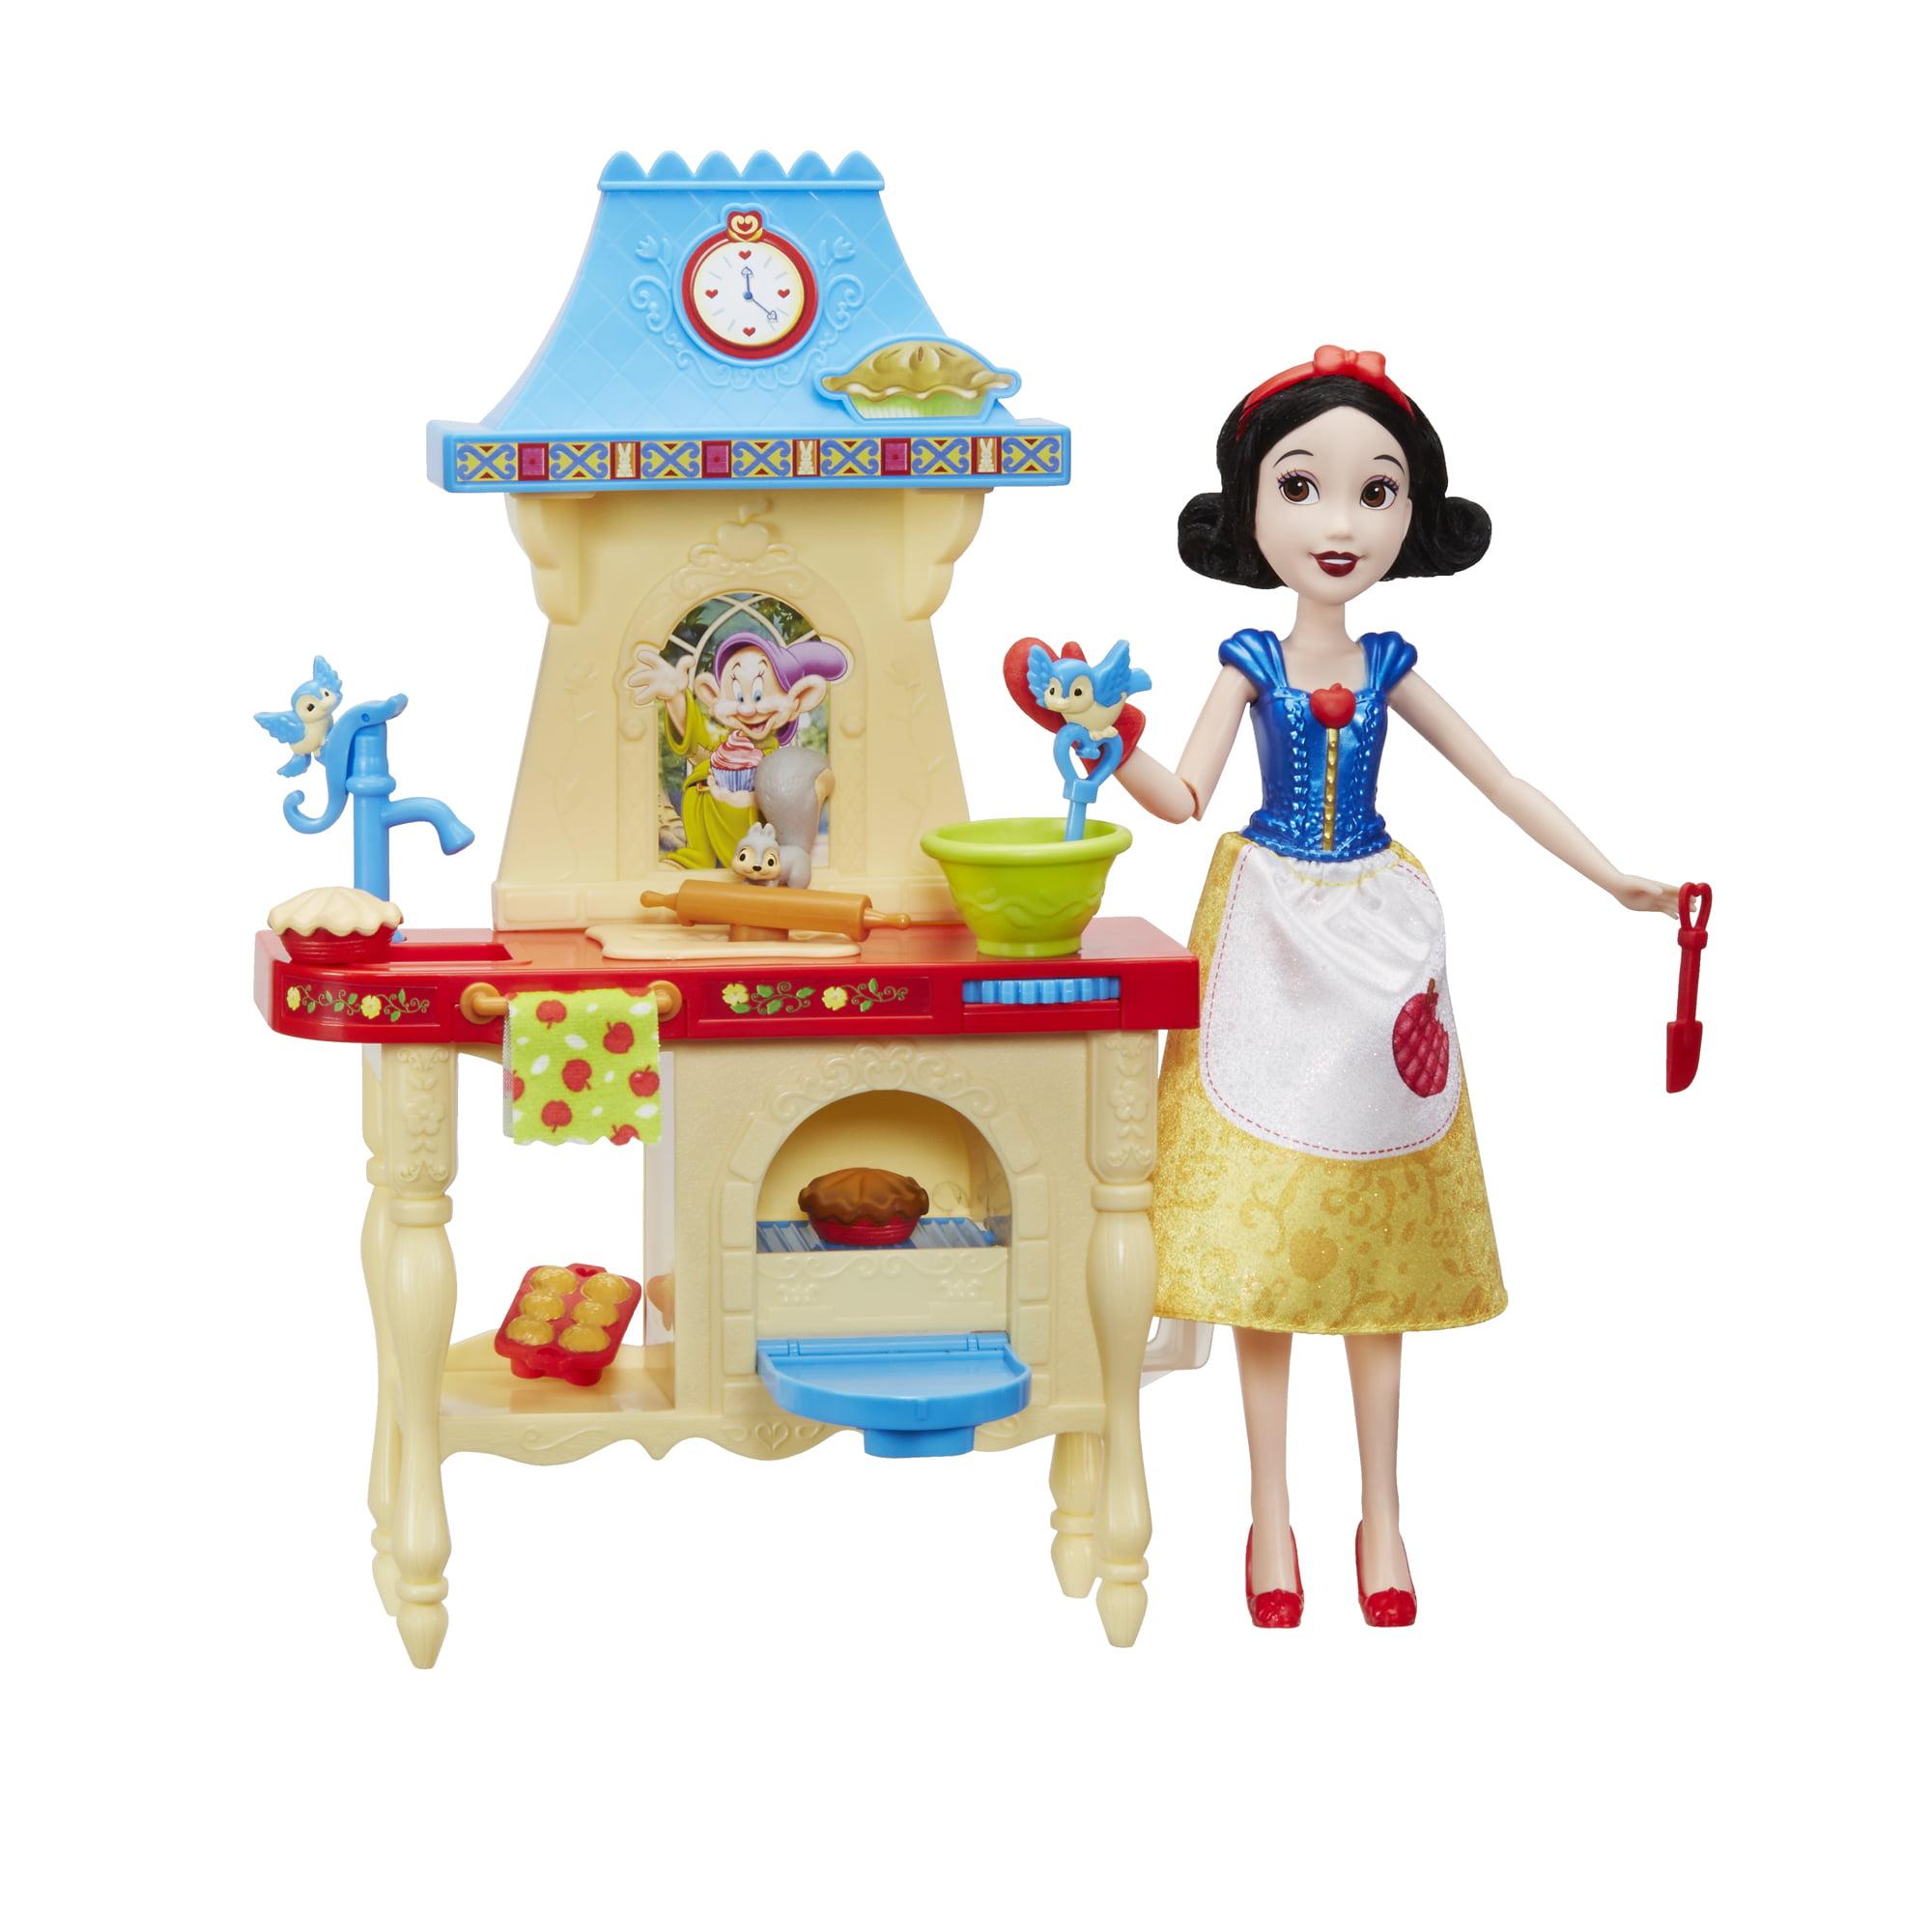 Disney Princess Stir 'n Bake Kitchen by Hasbro